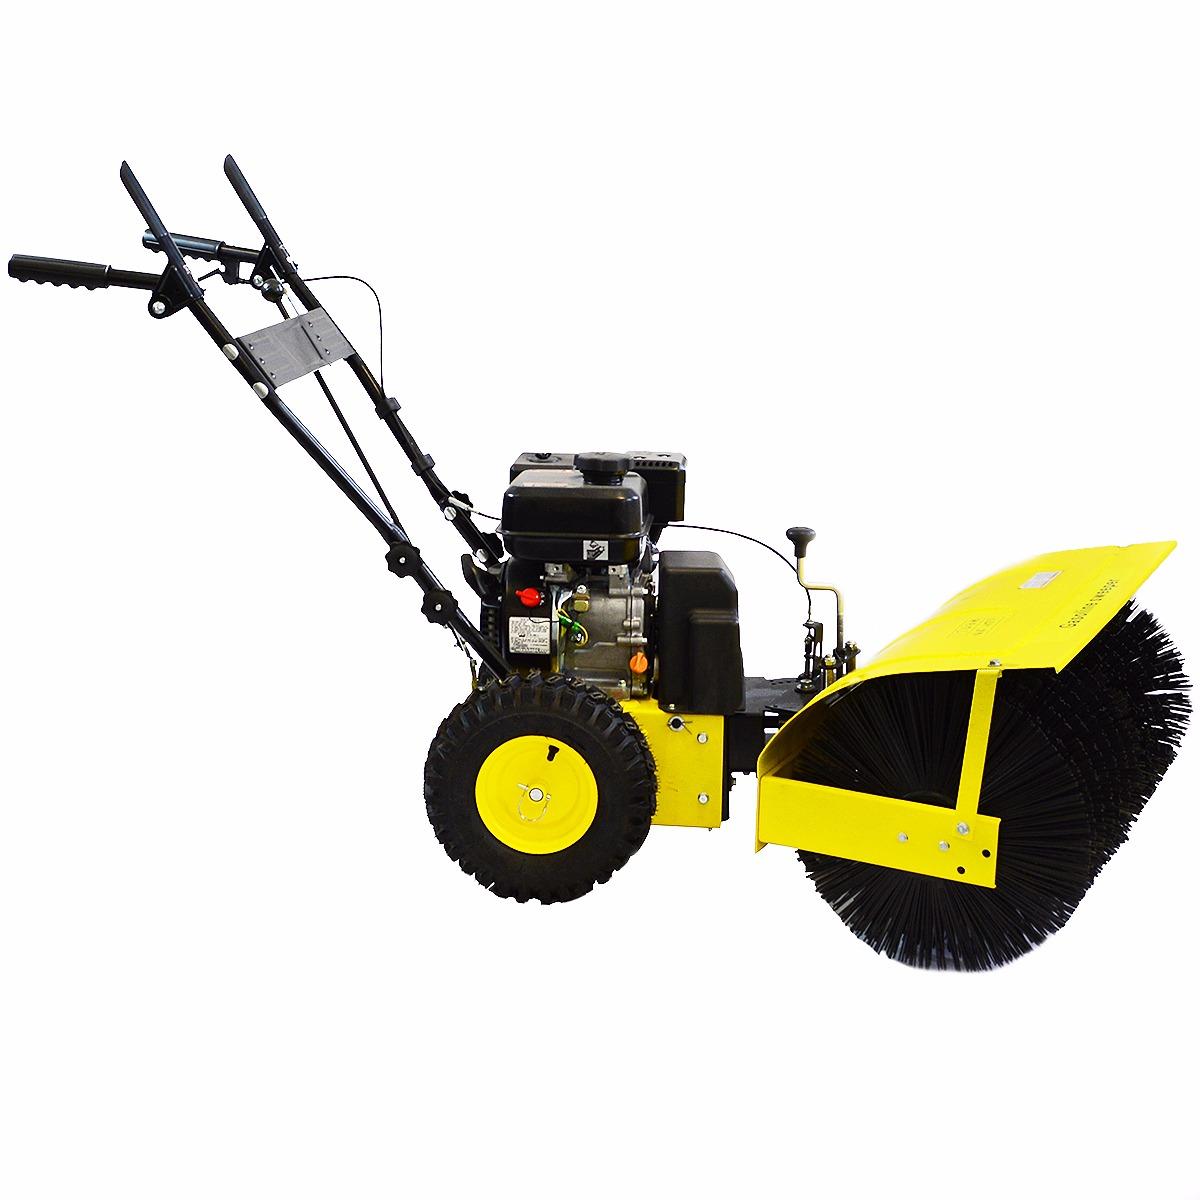 31 Quot Walk Behind Snow Sweeper Power Brush Broom Industrial